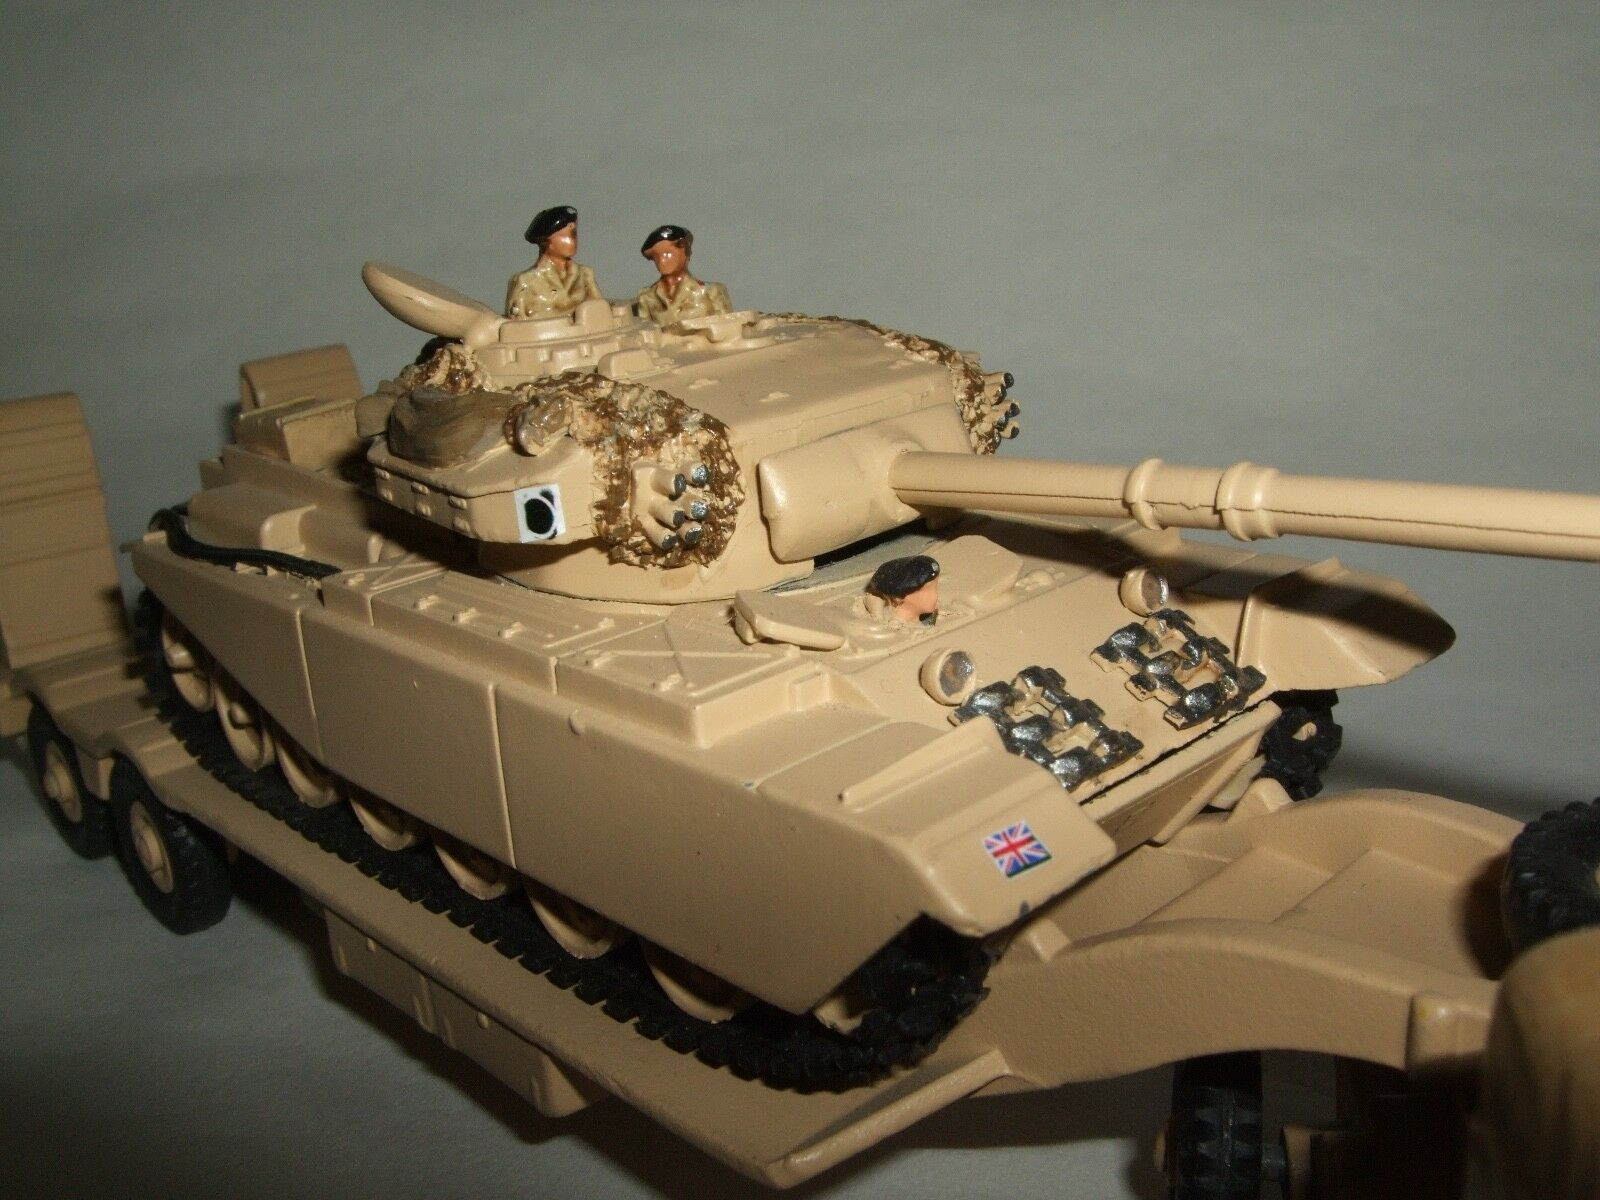 prydlig & Corgi Job lot, Antar Tank TRANSPORTER & Corgi TANK Original prydlig låda.